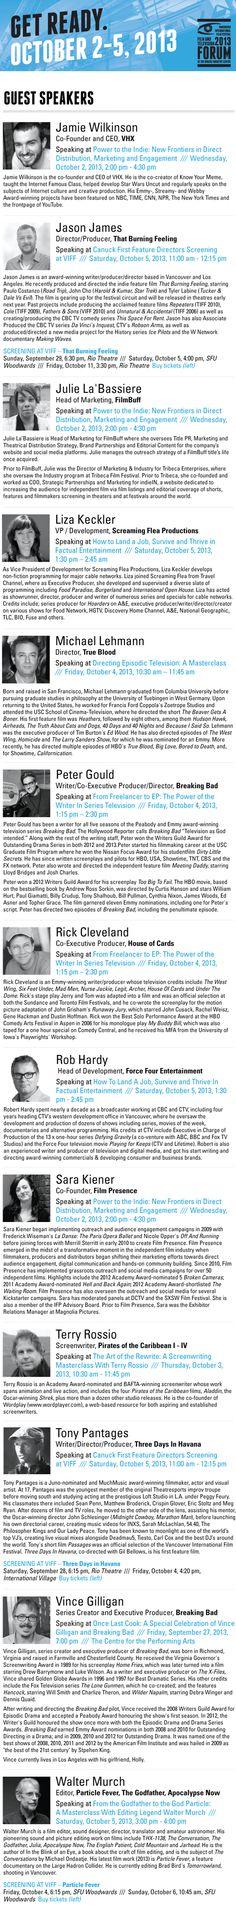 Forum Guests 2 Guest Speakers, International Film Festival, Vancouver